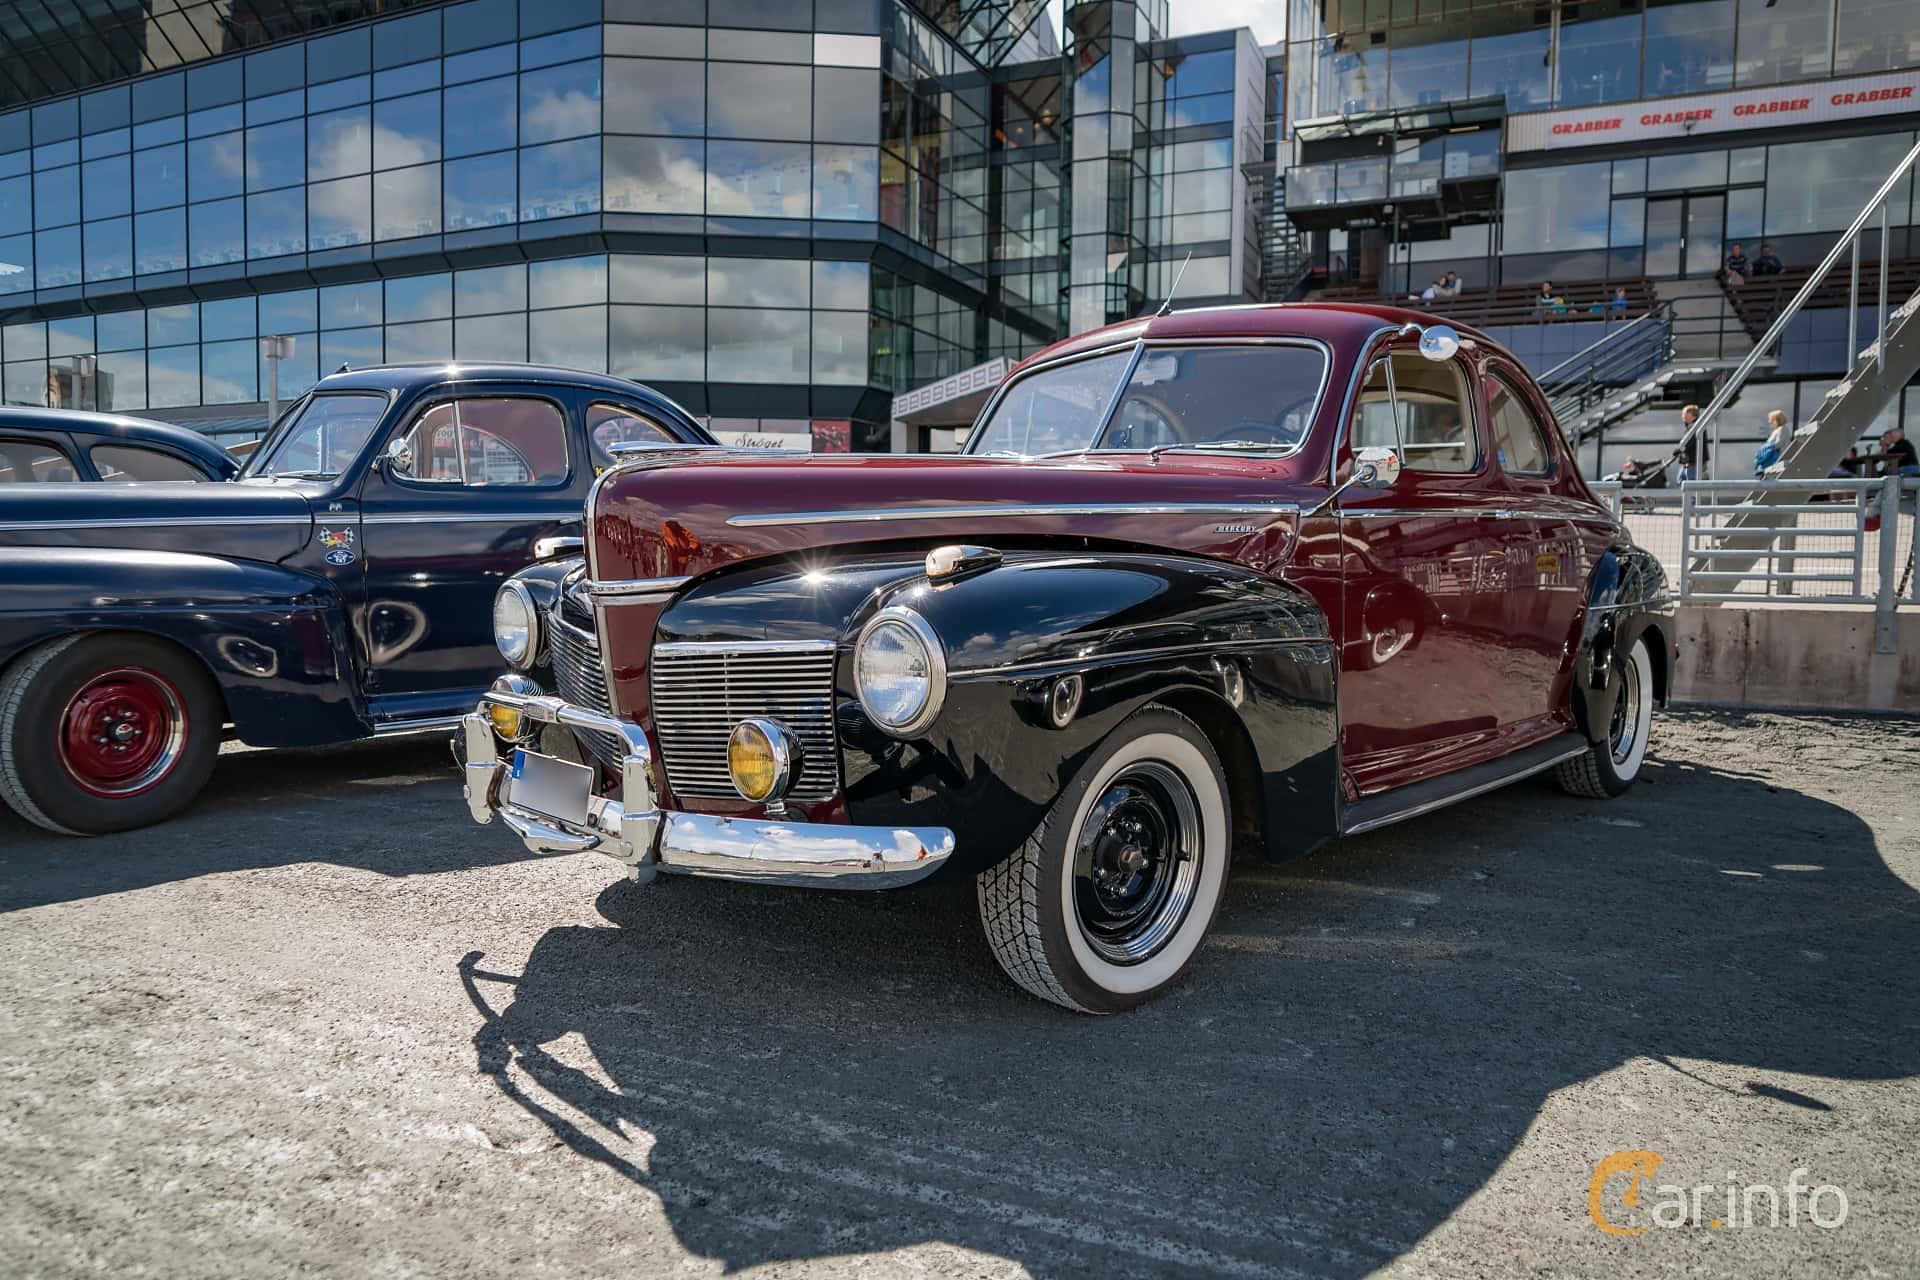 Tagen P Wheels Nationals Stockholm 2017 1941 Mercury Custom Cars Marcusliedholm